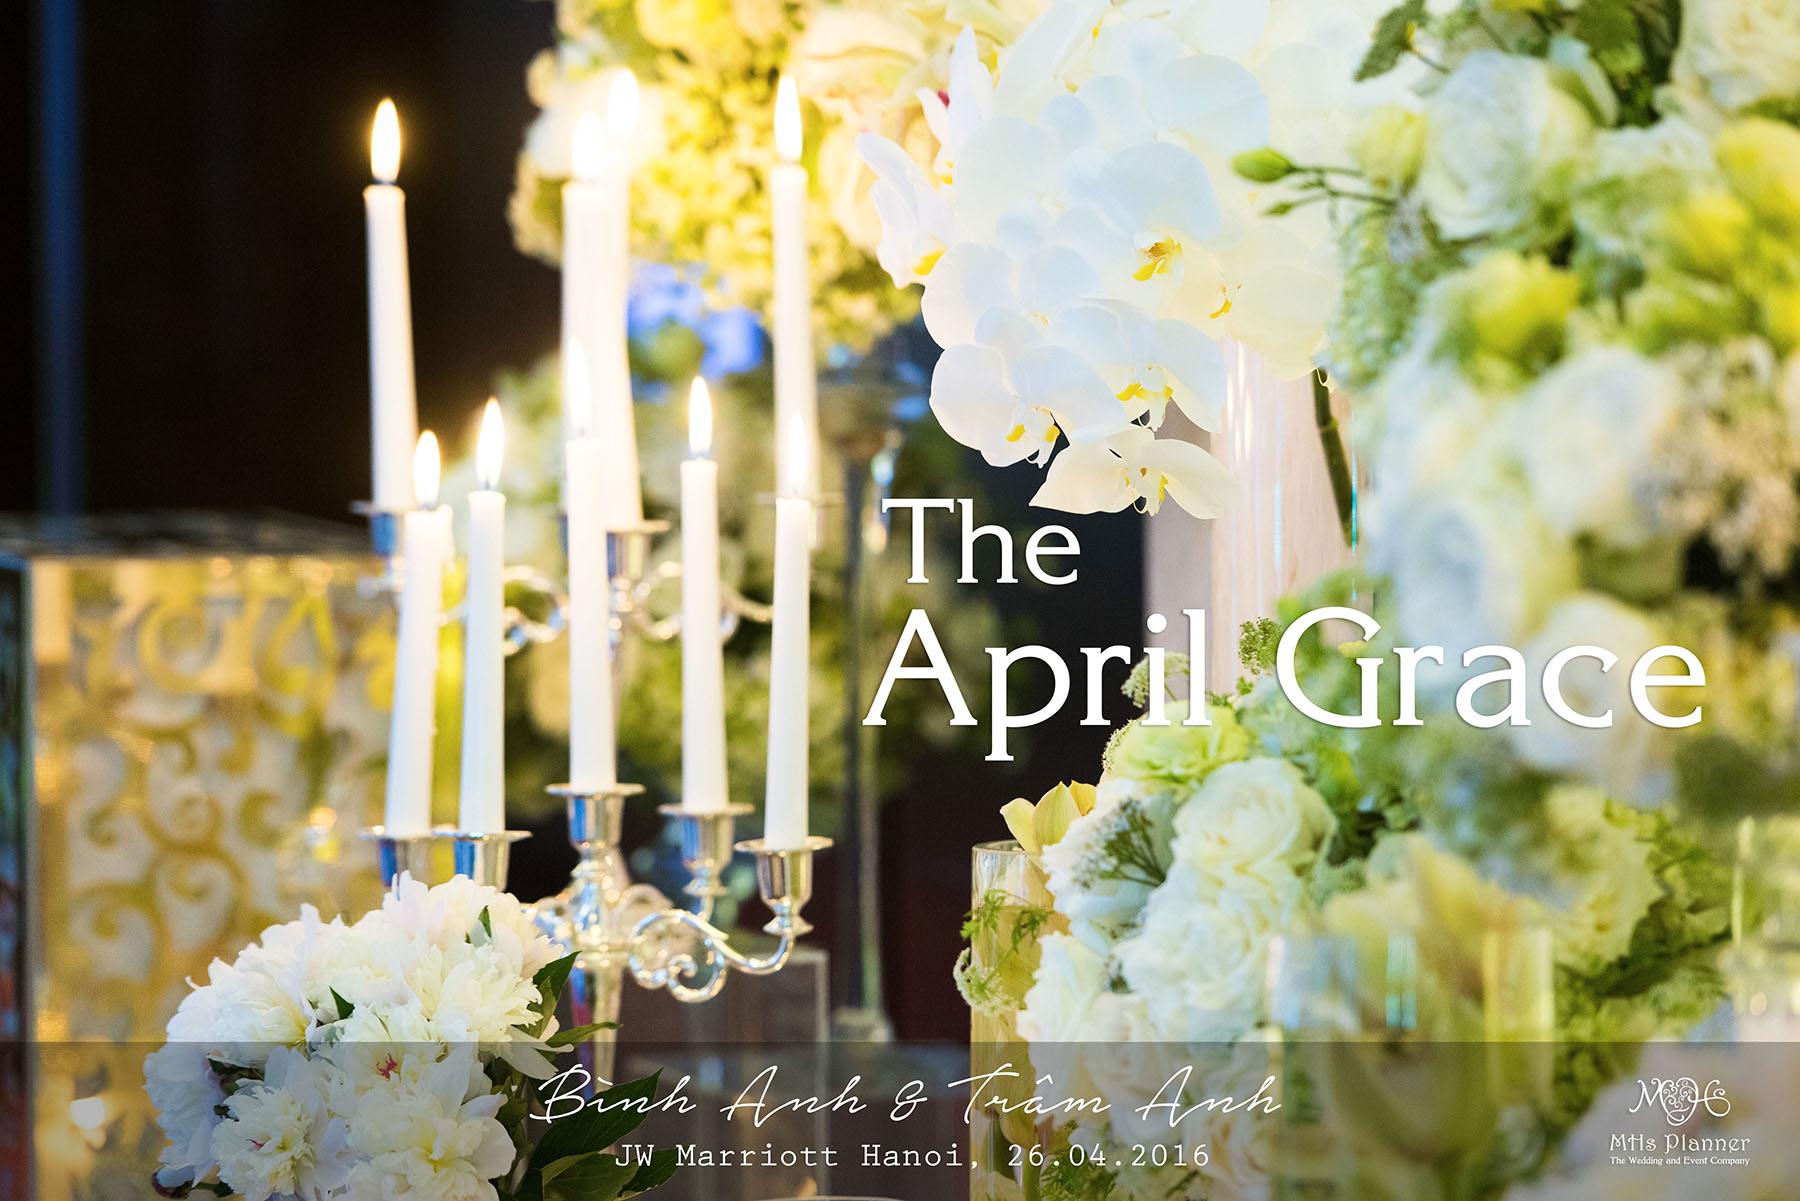 The April